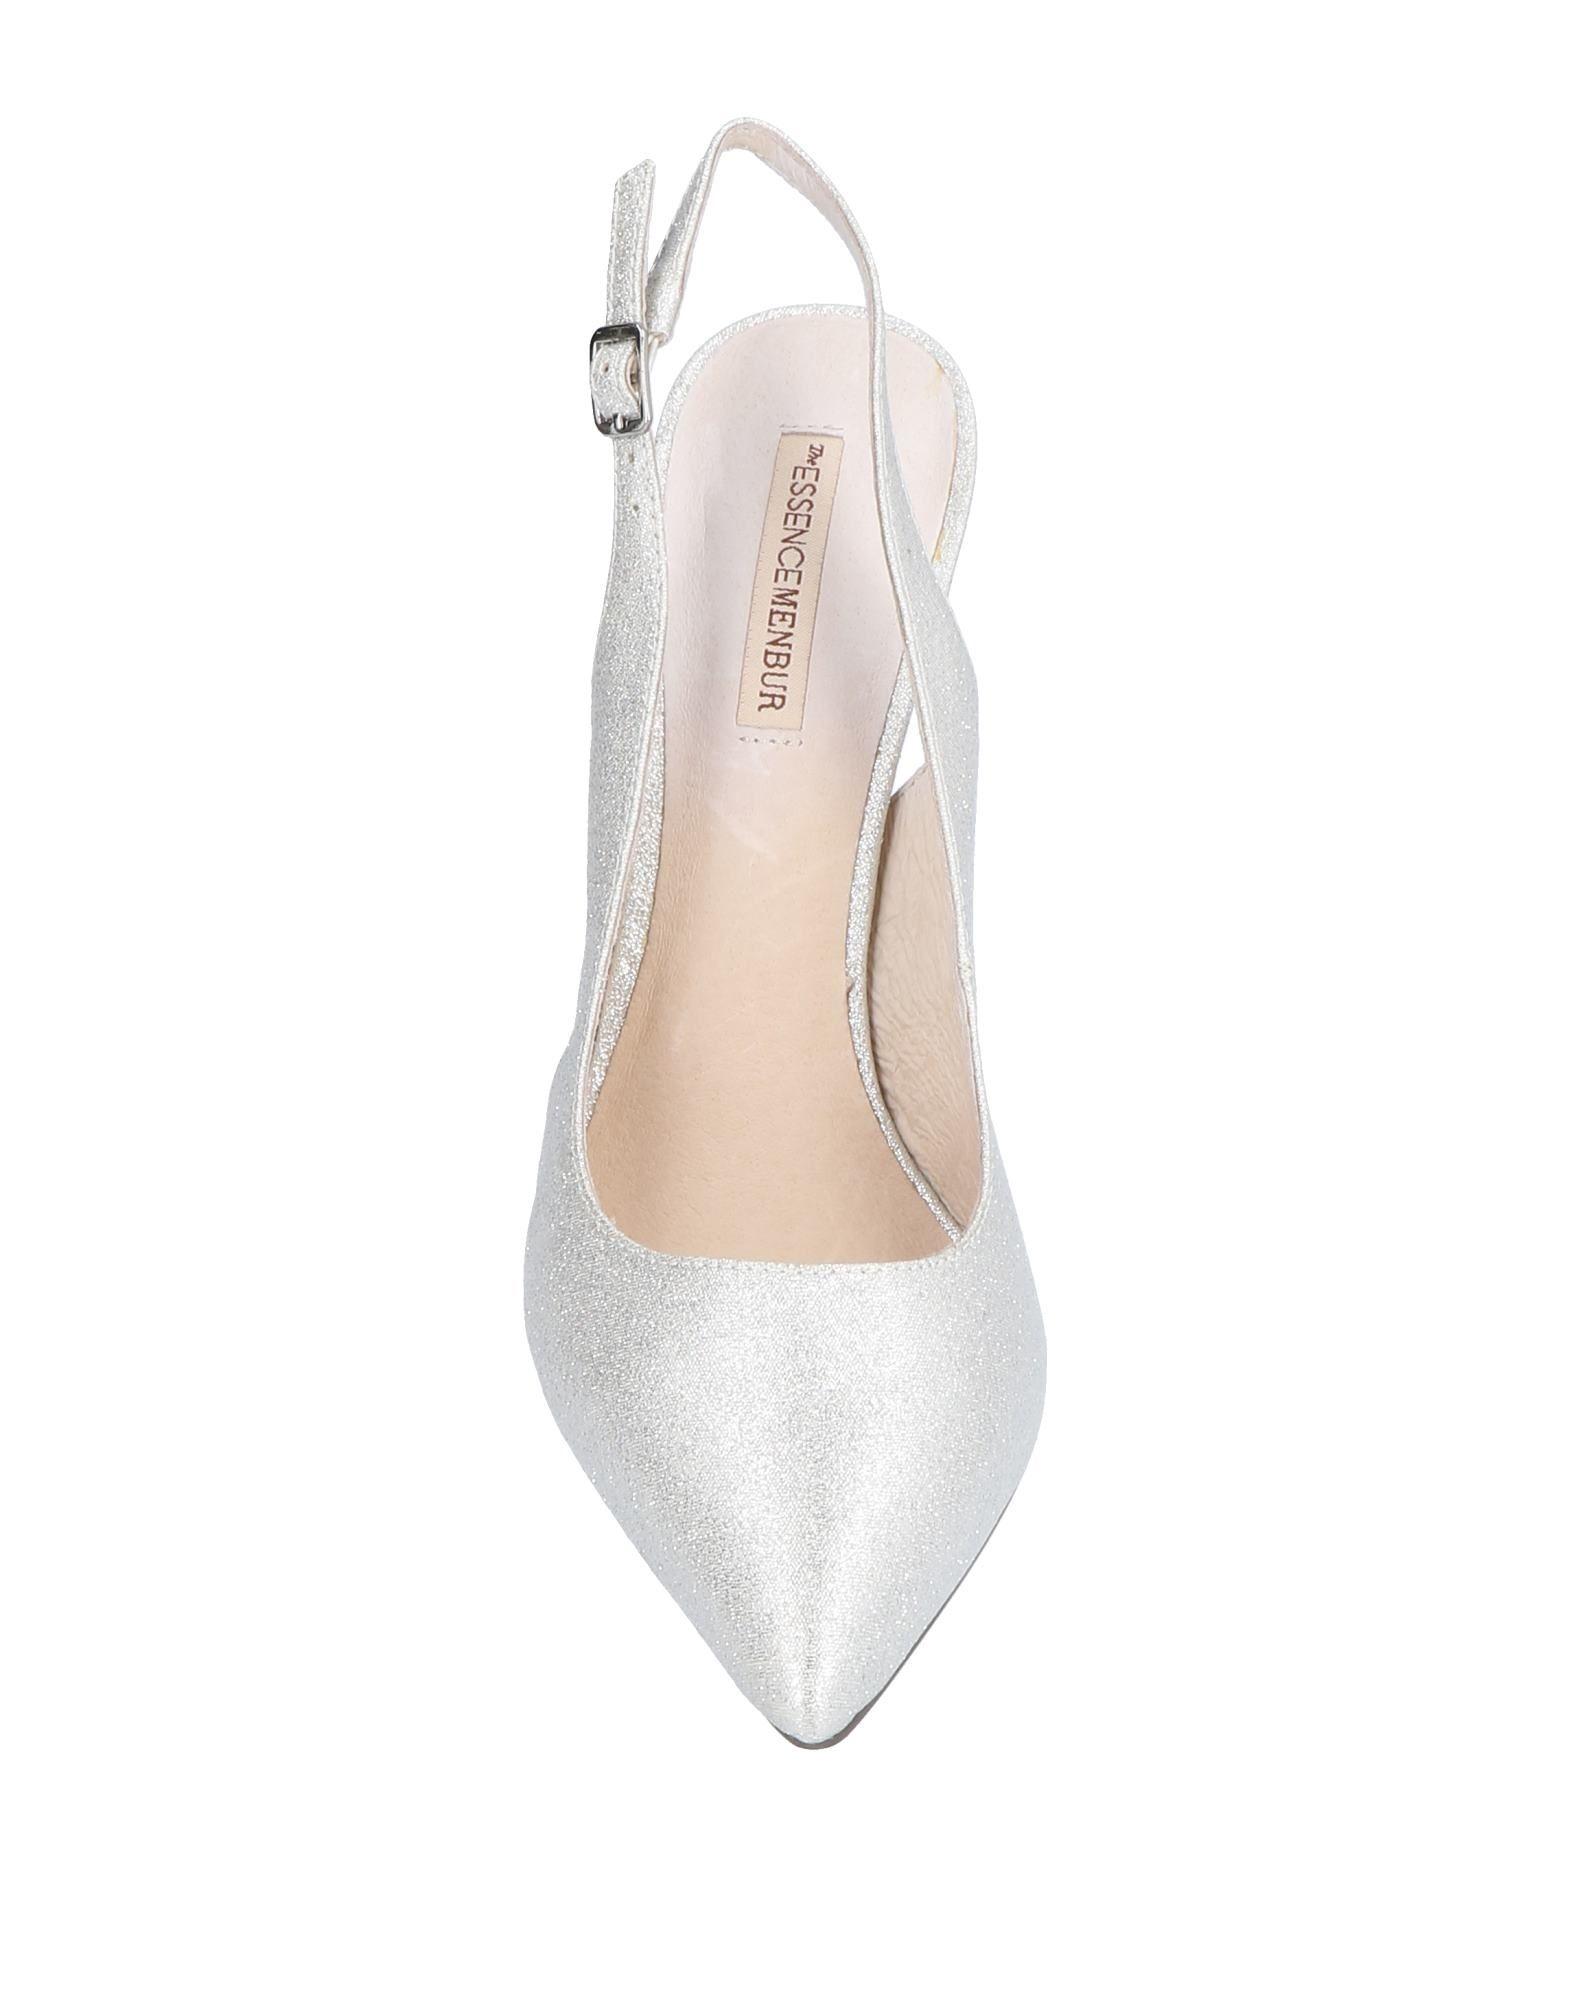 Menbur Gute Pumps Damen  11498466VJ Gute Menbur Qualität beliebte Schuhe fb3dff